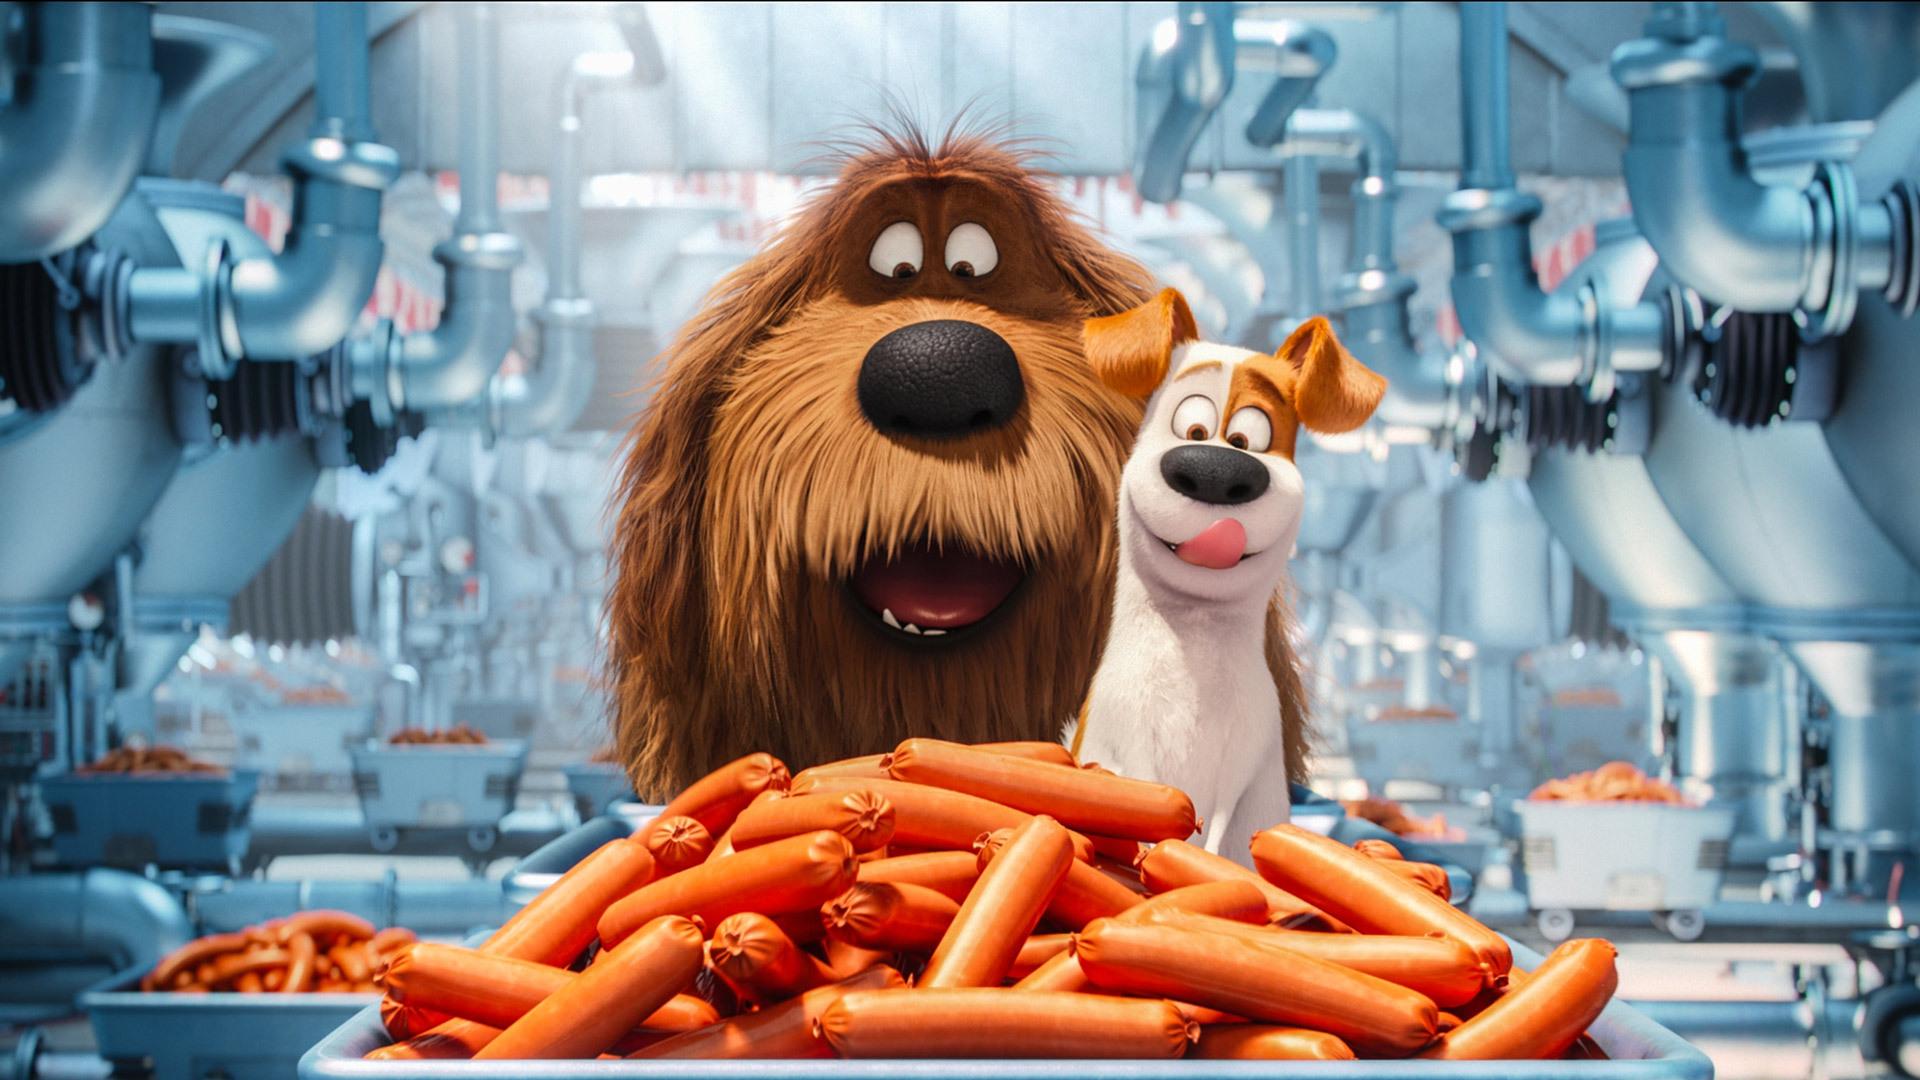 the-secrete-life-of-pets-animated-movie-on.jpg